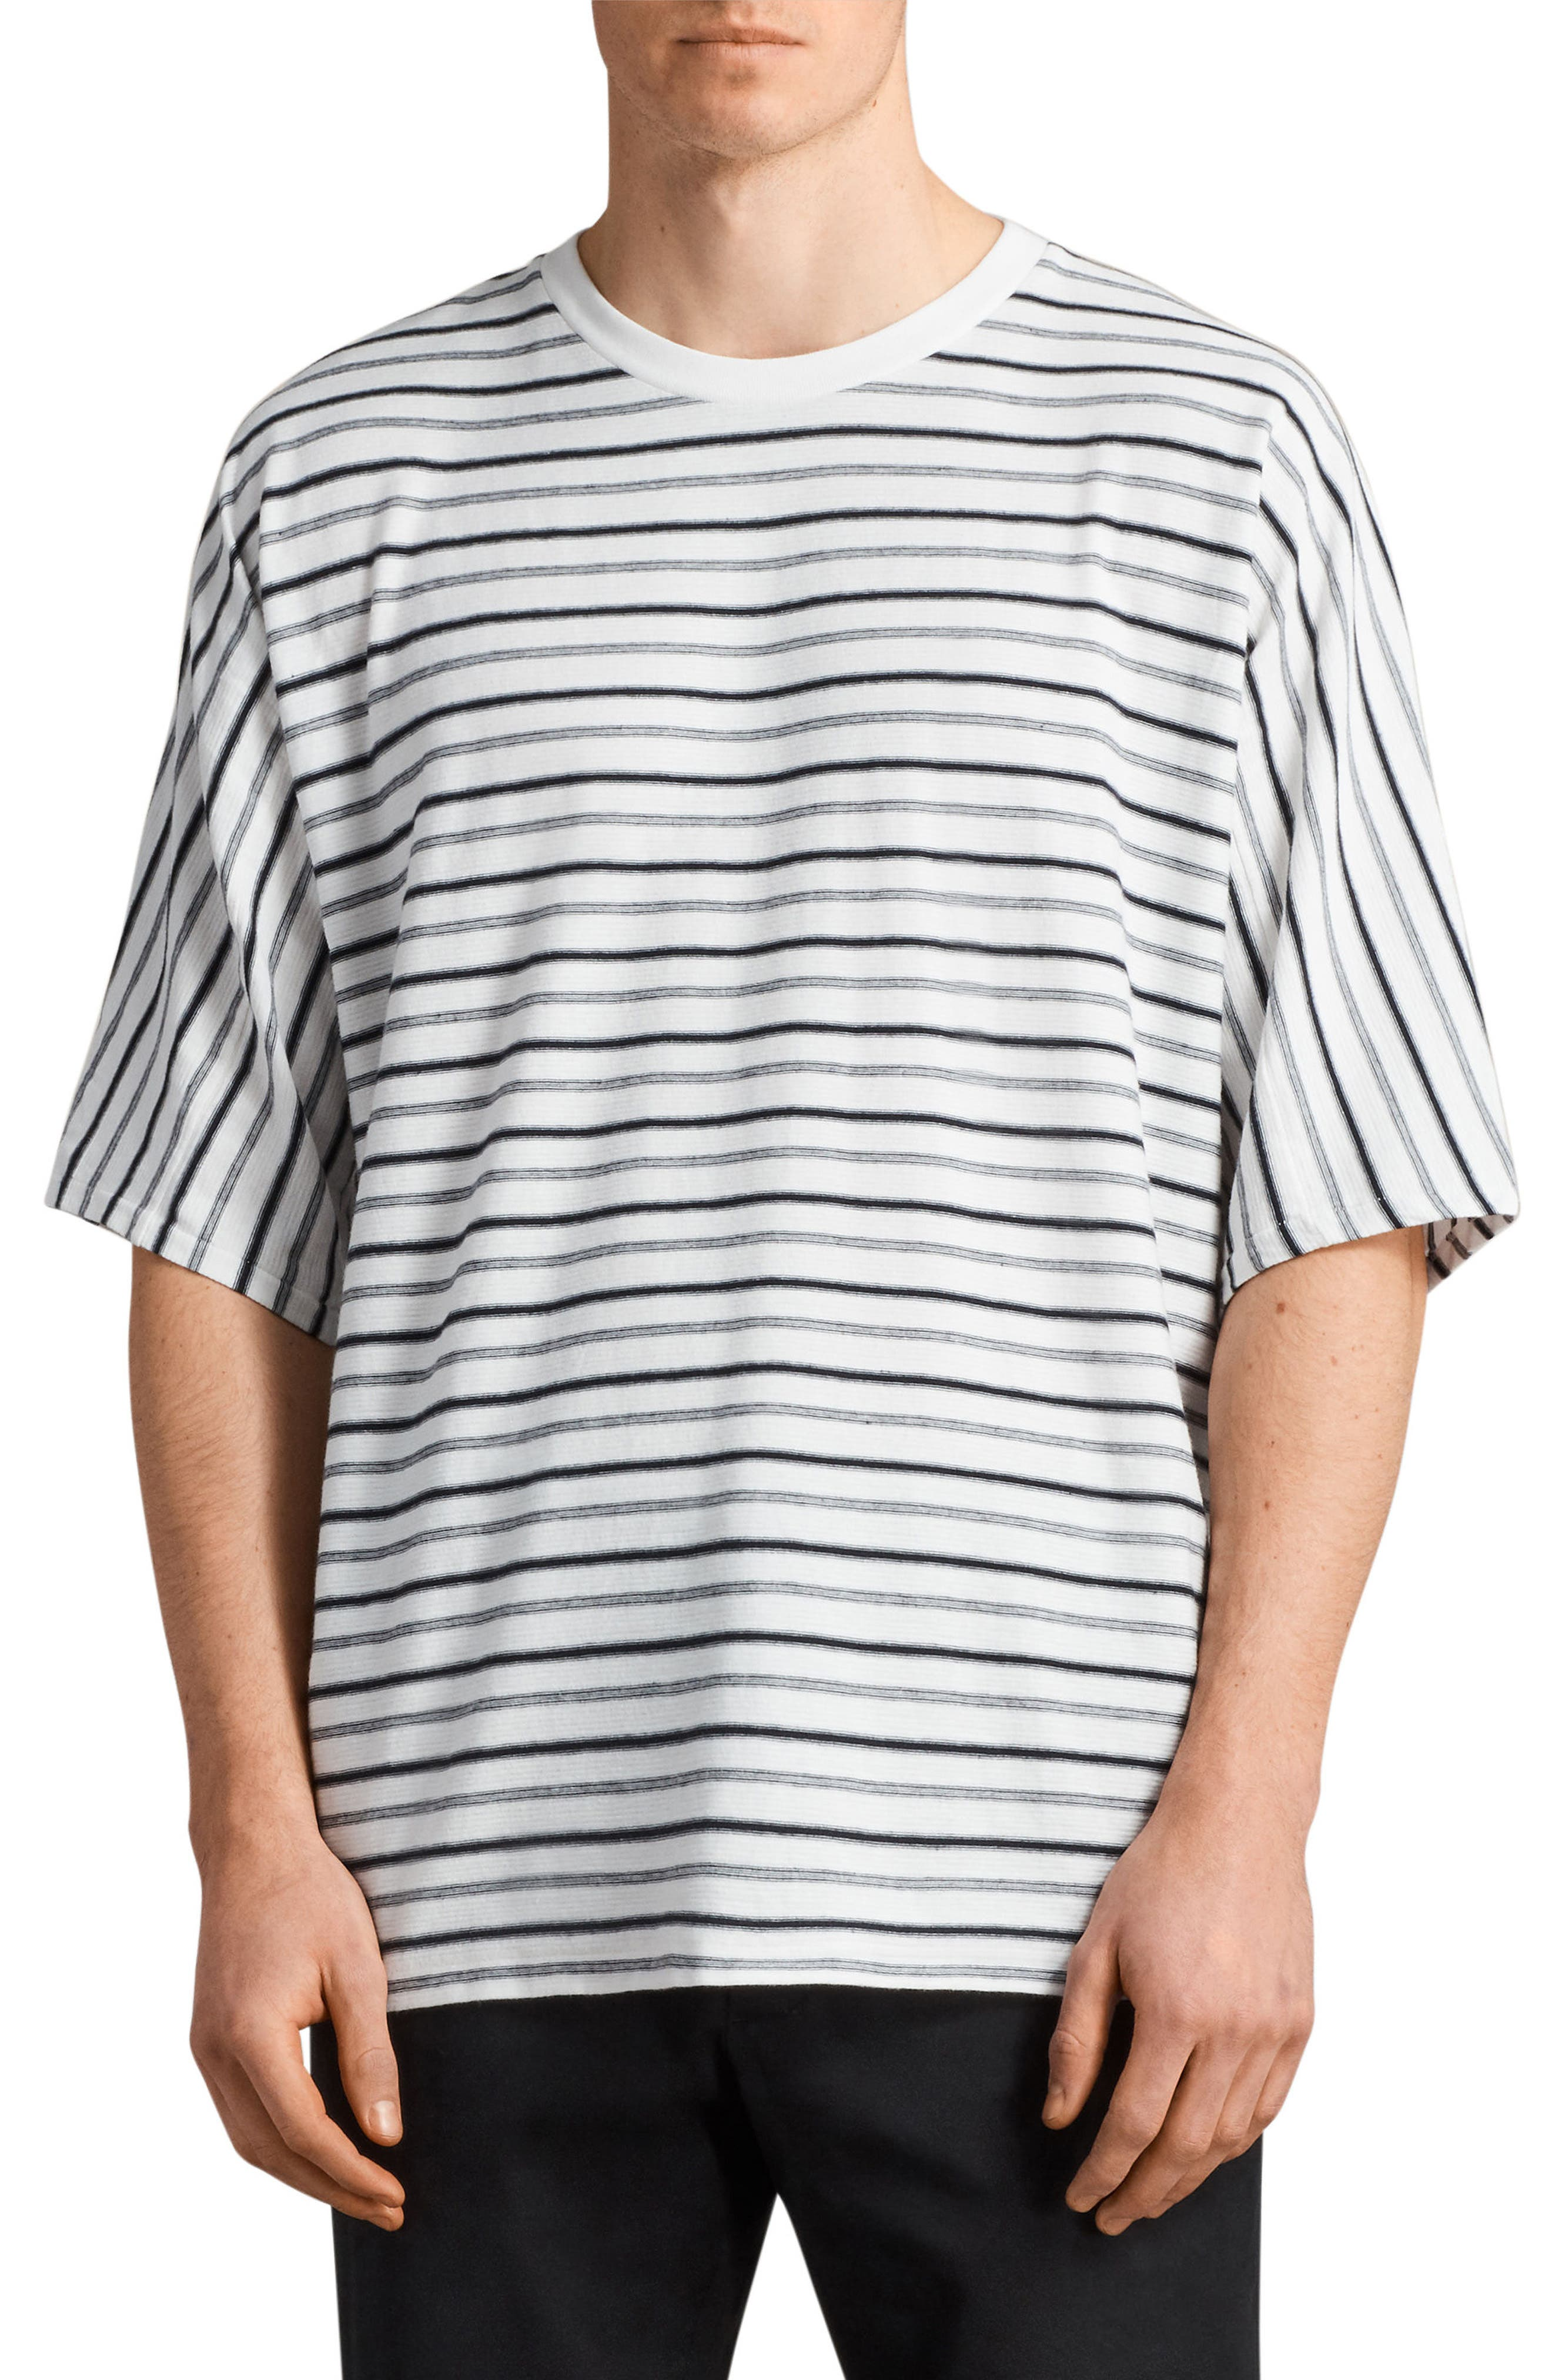 Jules Oversize Stripe T-Shirt,                             Main thumbnail 1, color,                             Chk White/ Ink Navy